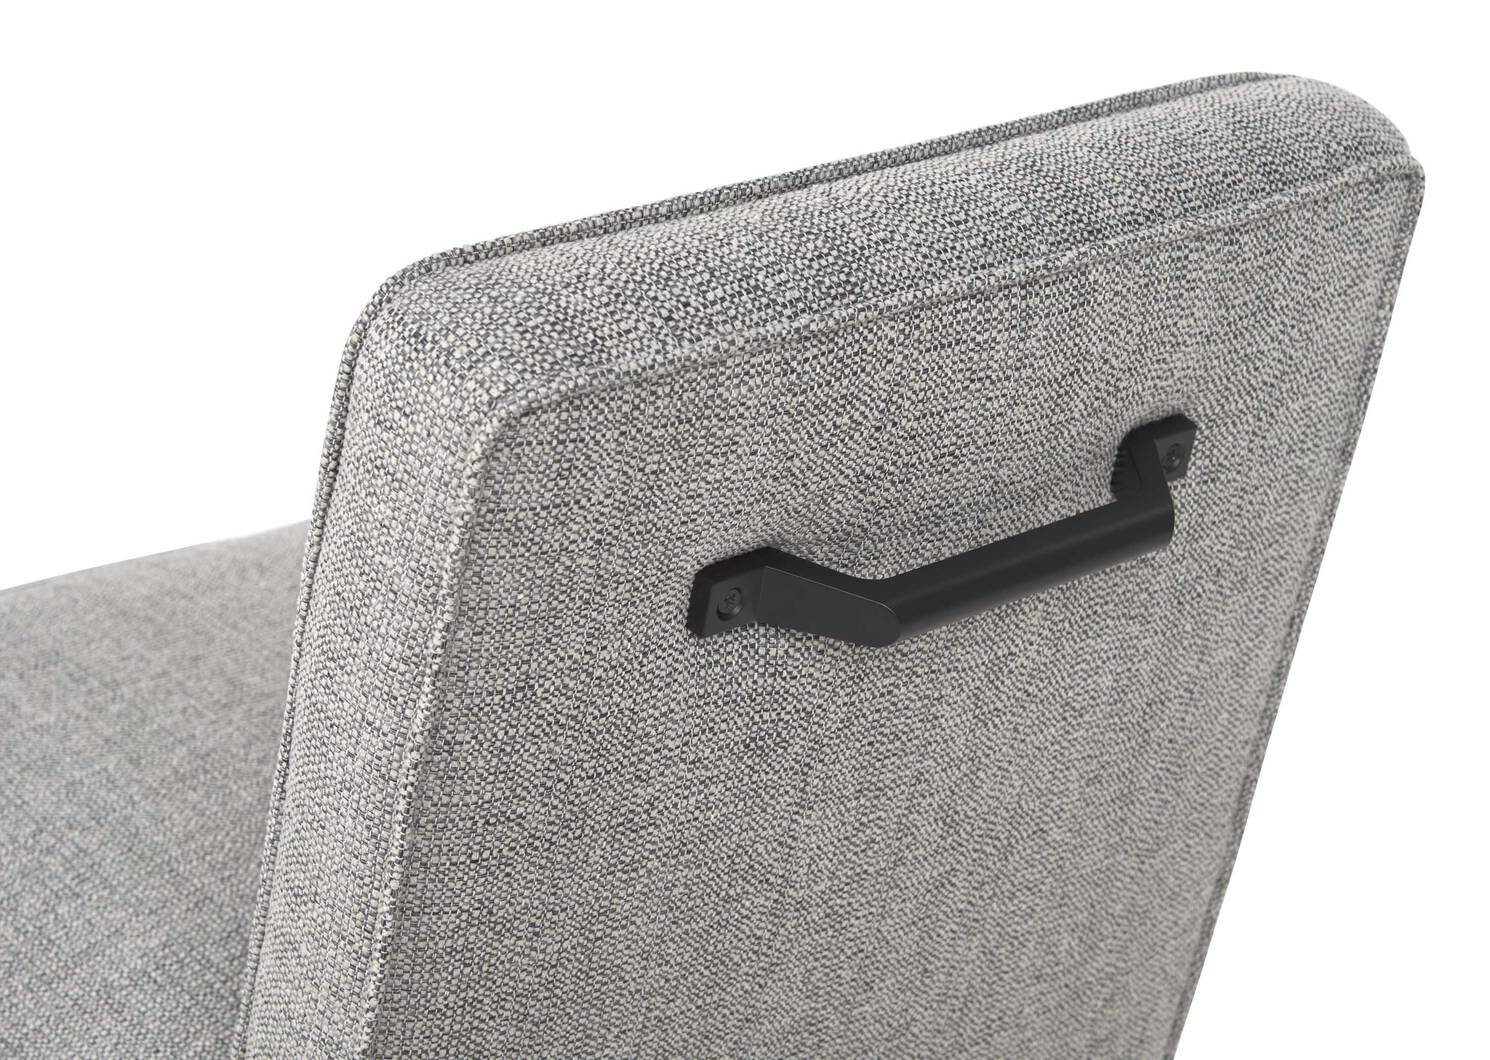 Baxter Dining Chair -Marlin Gravel